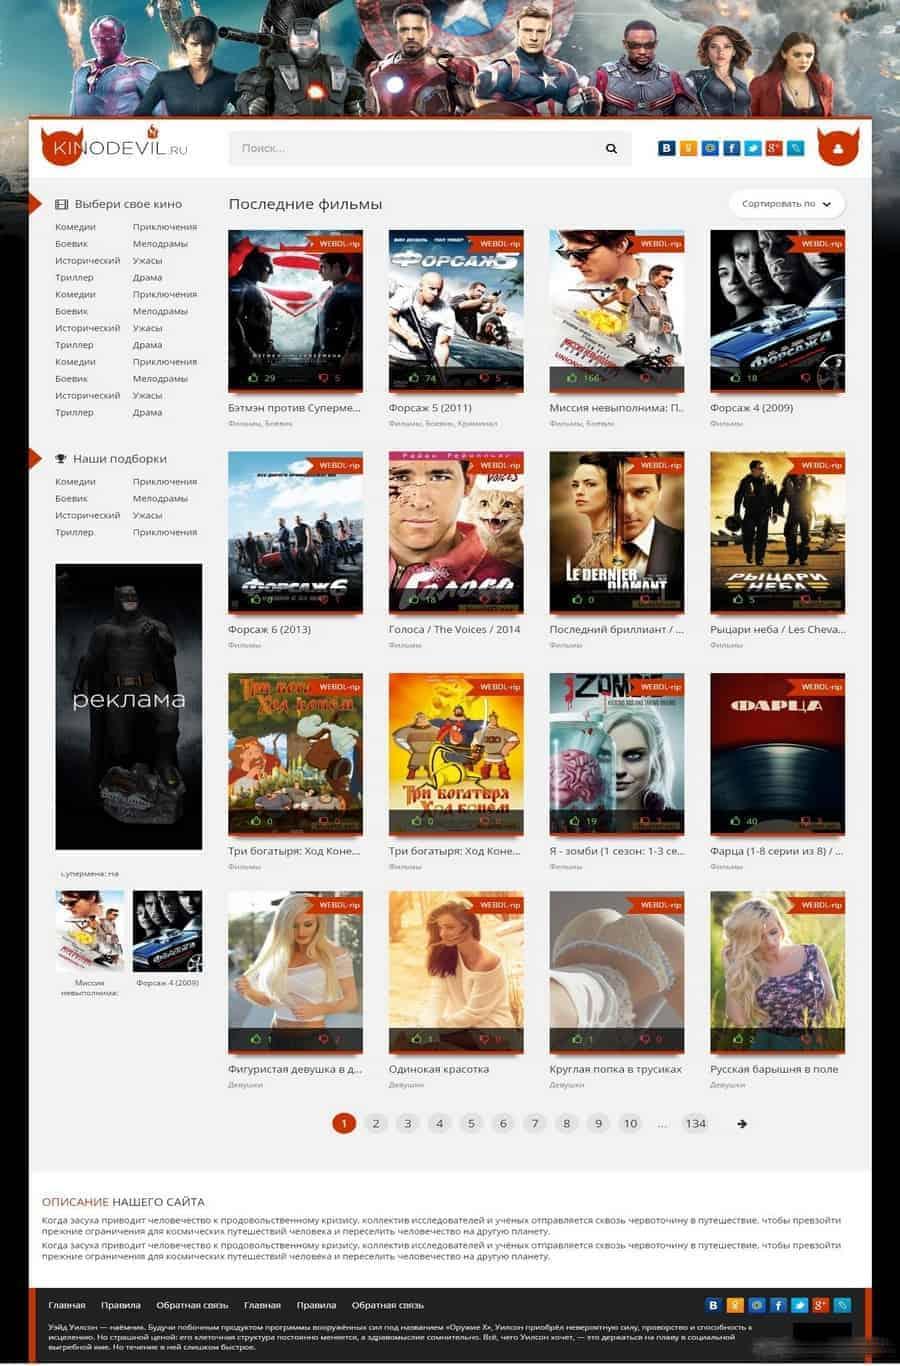 KinoDevil – адаптивный кино шаблон для DLE